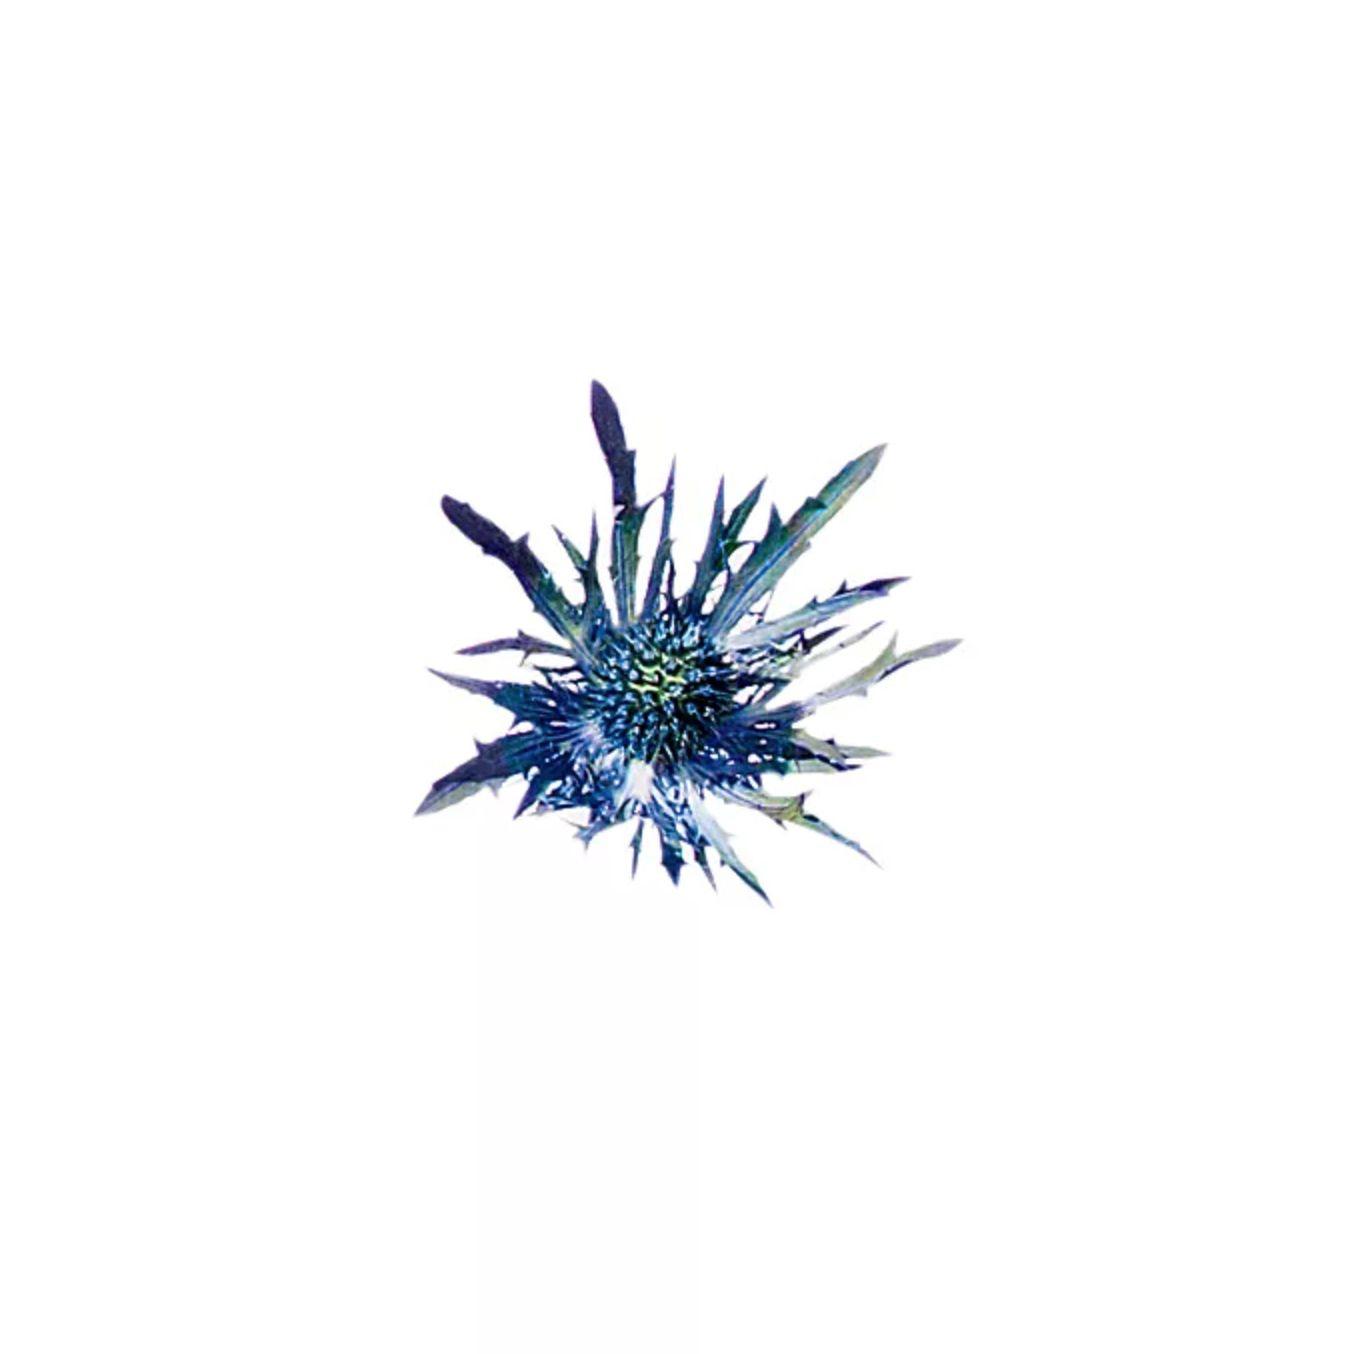 Blue thistle flower